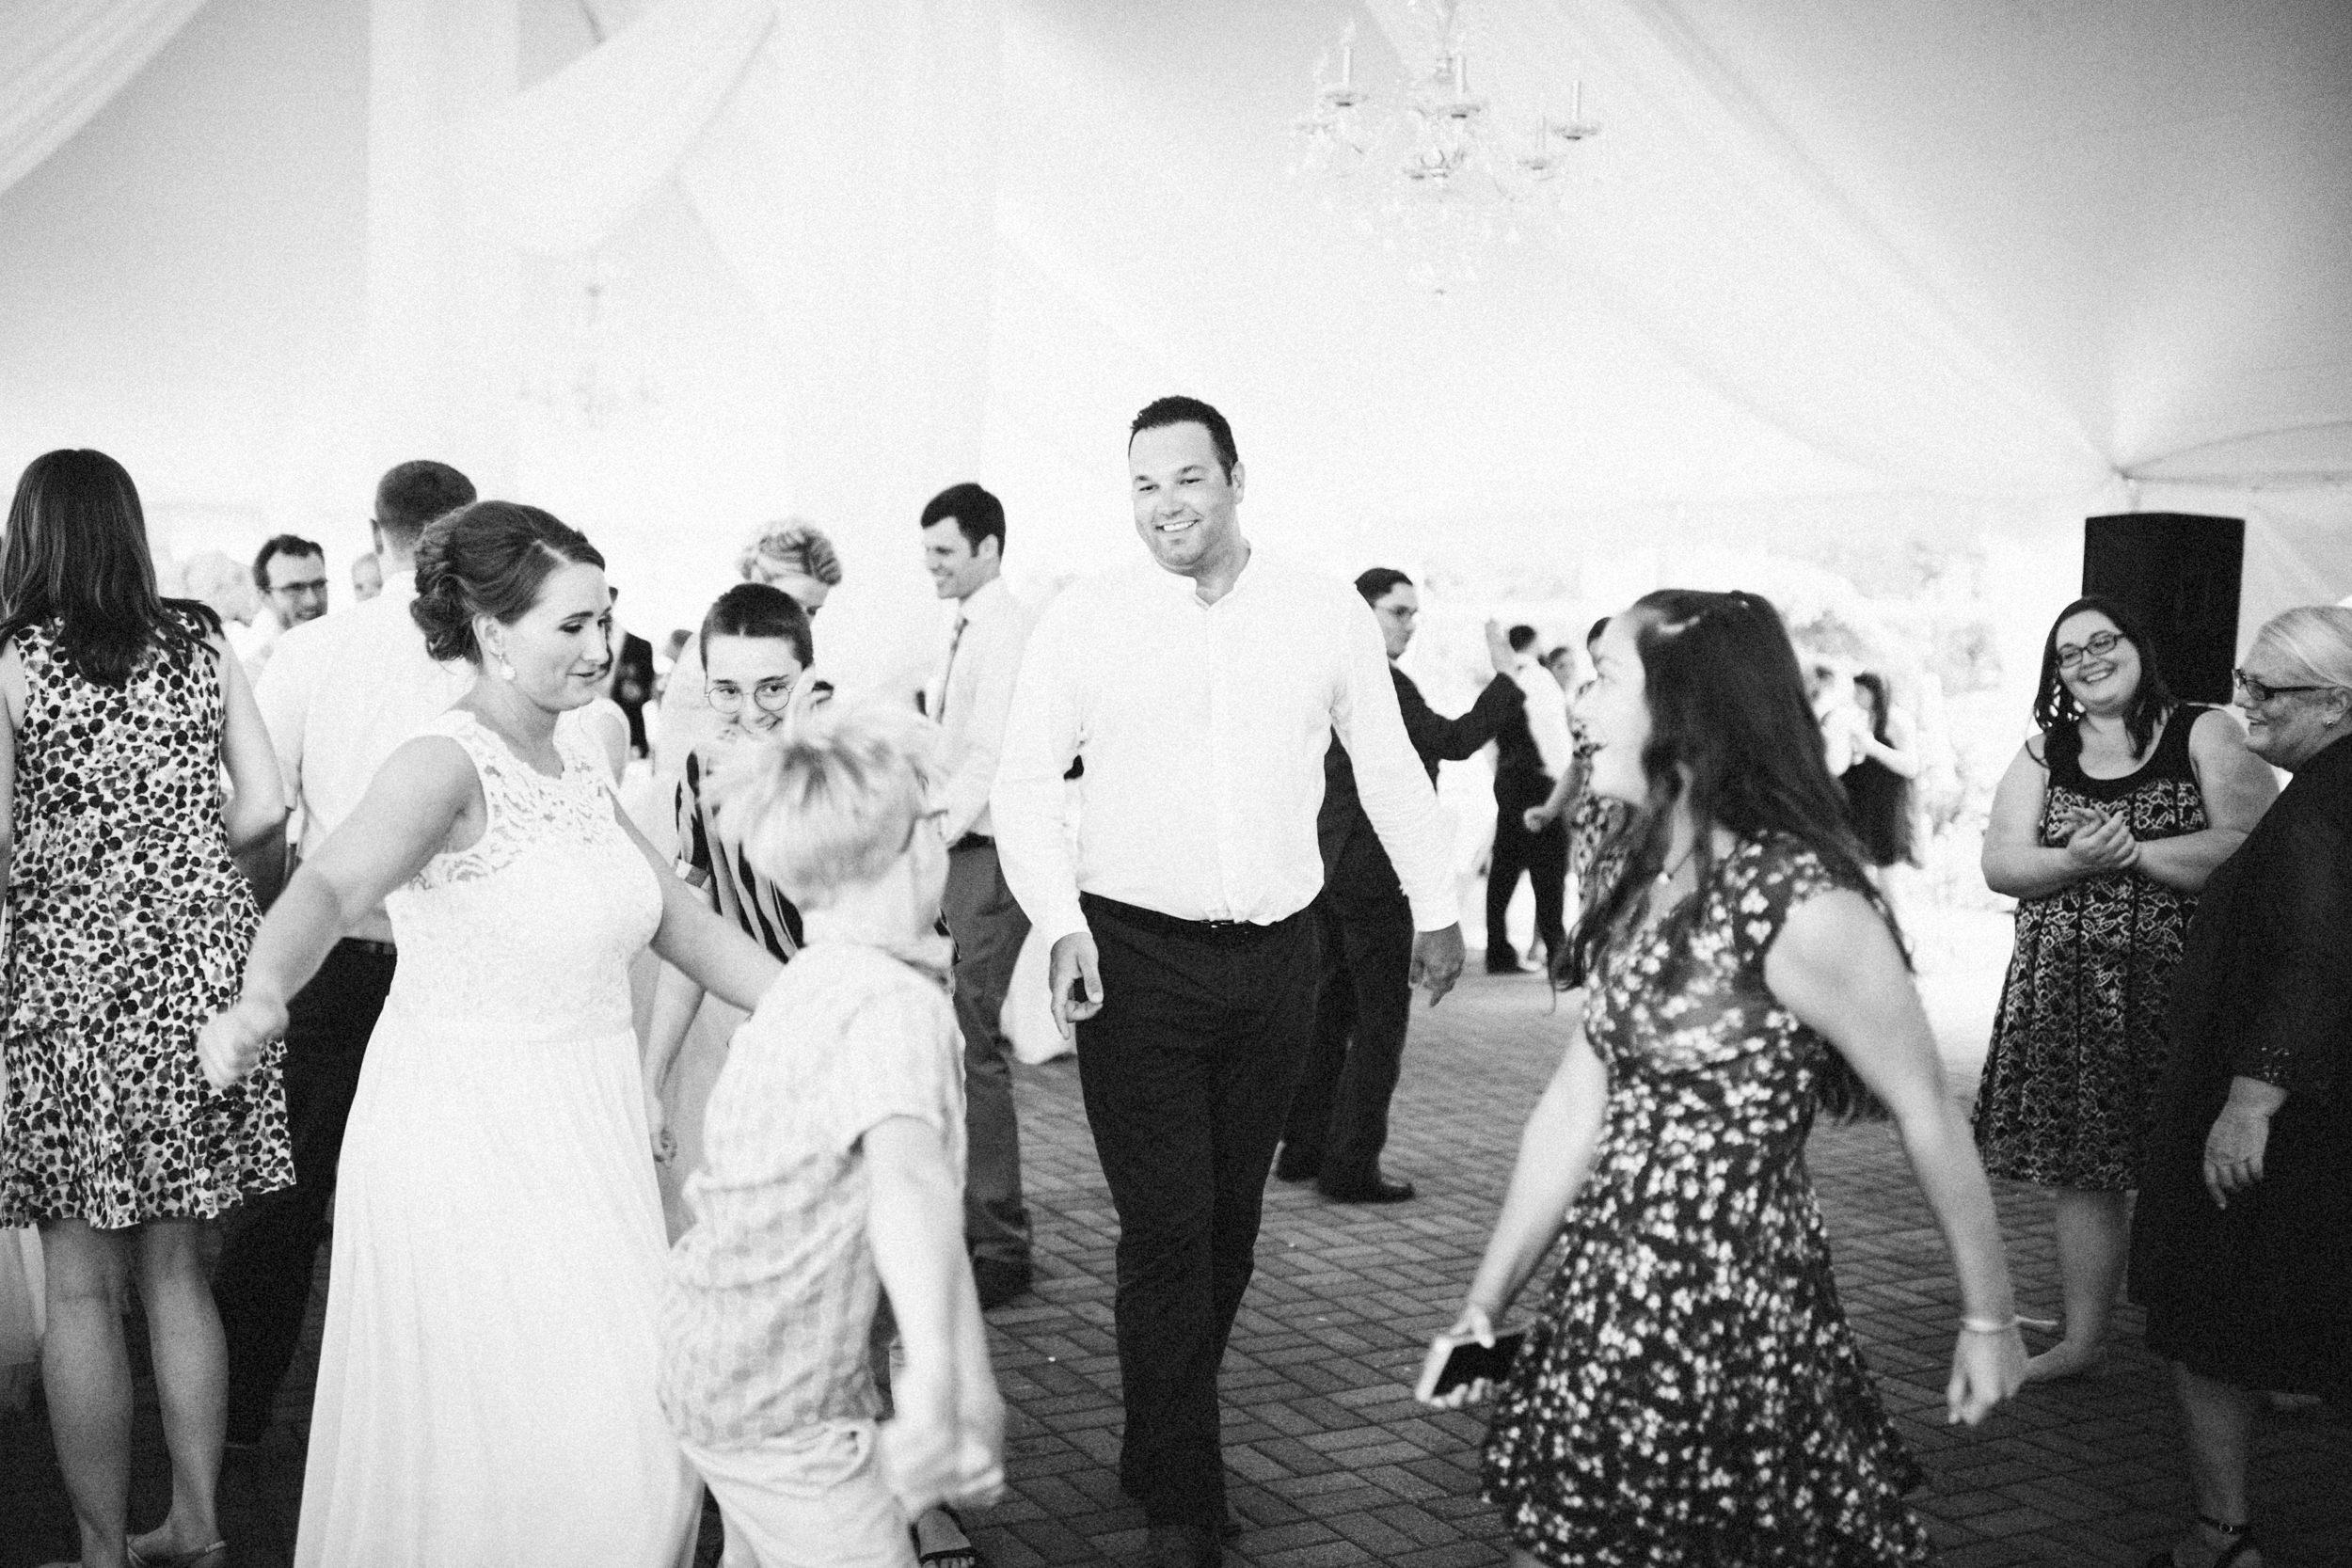 Louisville-Kentucky-Wedding-Elopement-Photographer-Sarah-Katherine-Davis-Photography-Whitehall-Classic-Timeless-Garden-Wedding-771.jpg